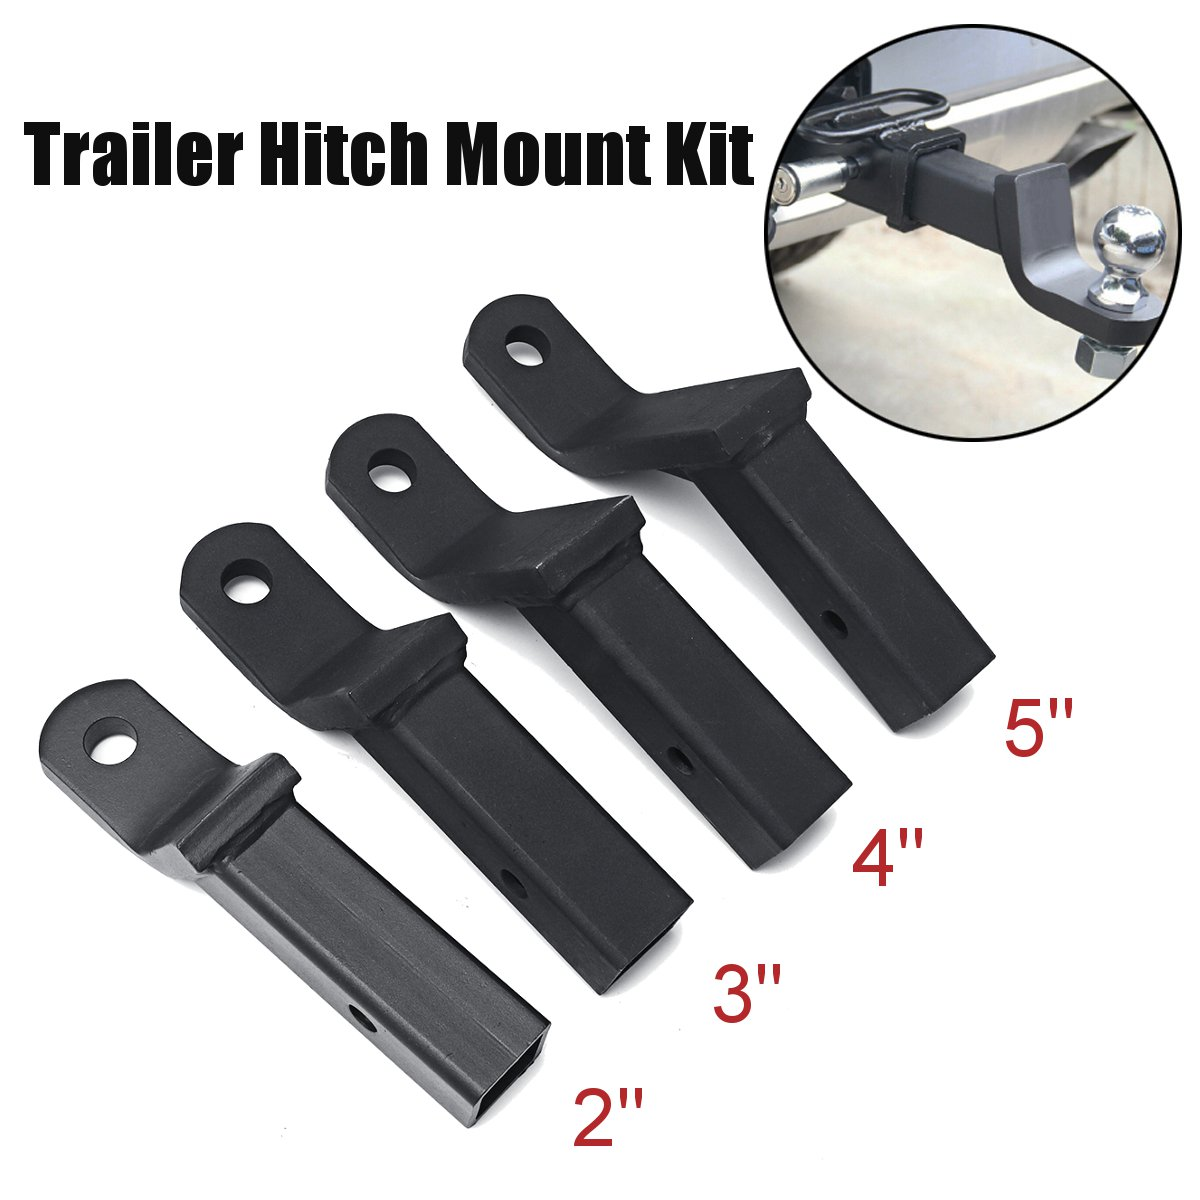 Steel Truck Trailer Hook Folding Trailer Hitch Mount Shank Adapter Cargo Wheelchair Carrier 2